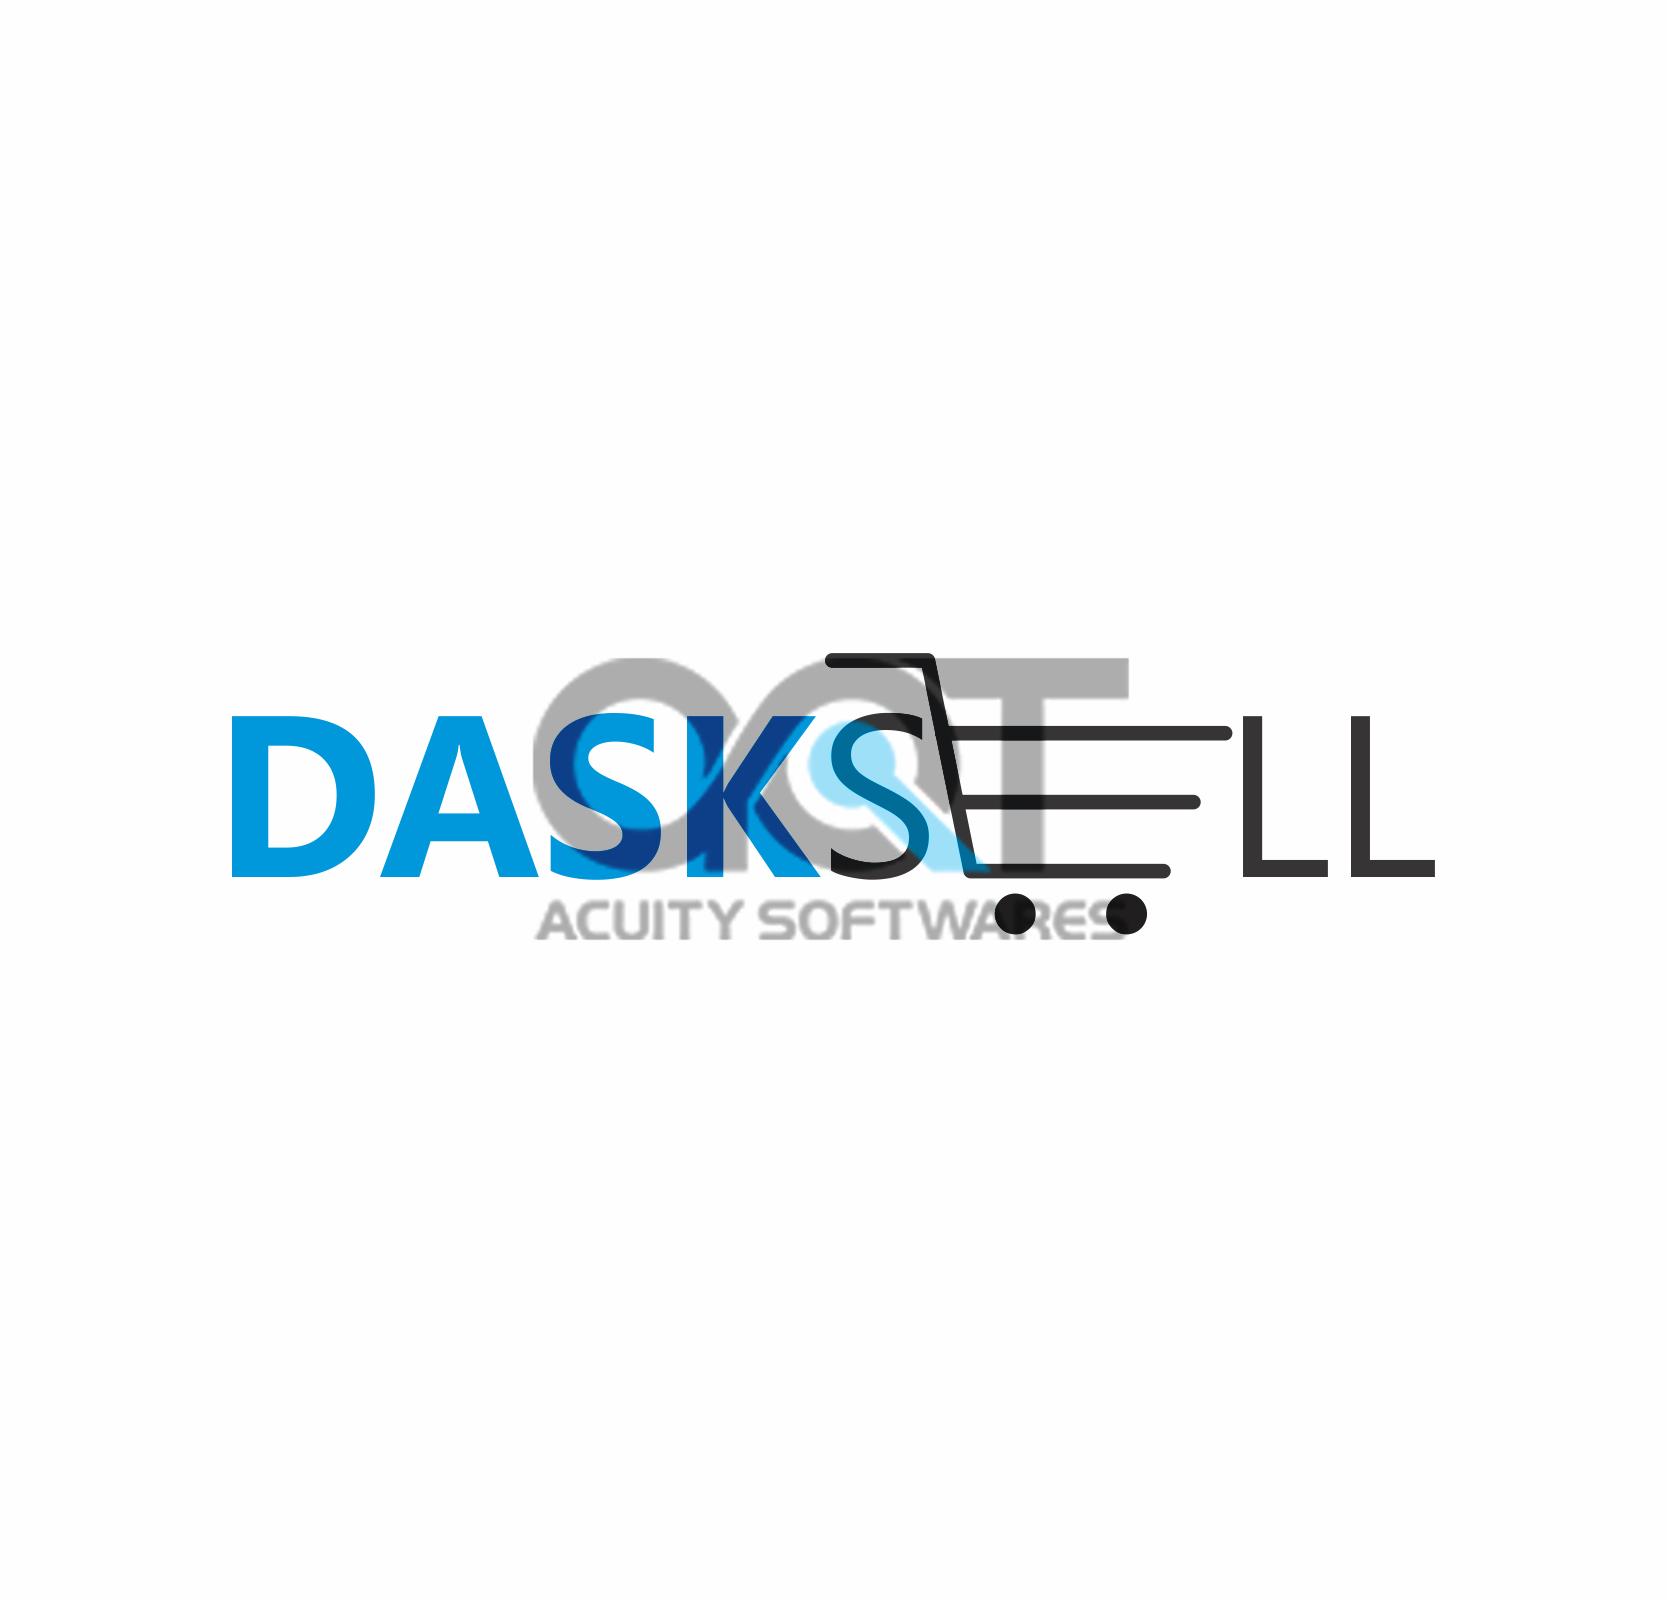 DASKSELL Logo